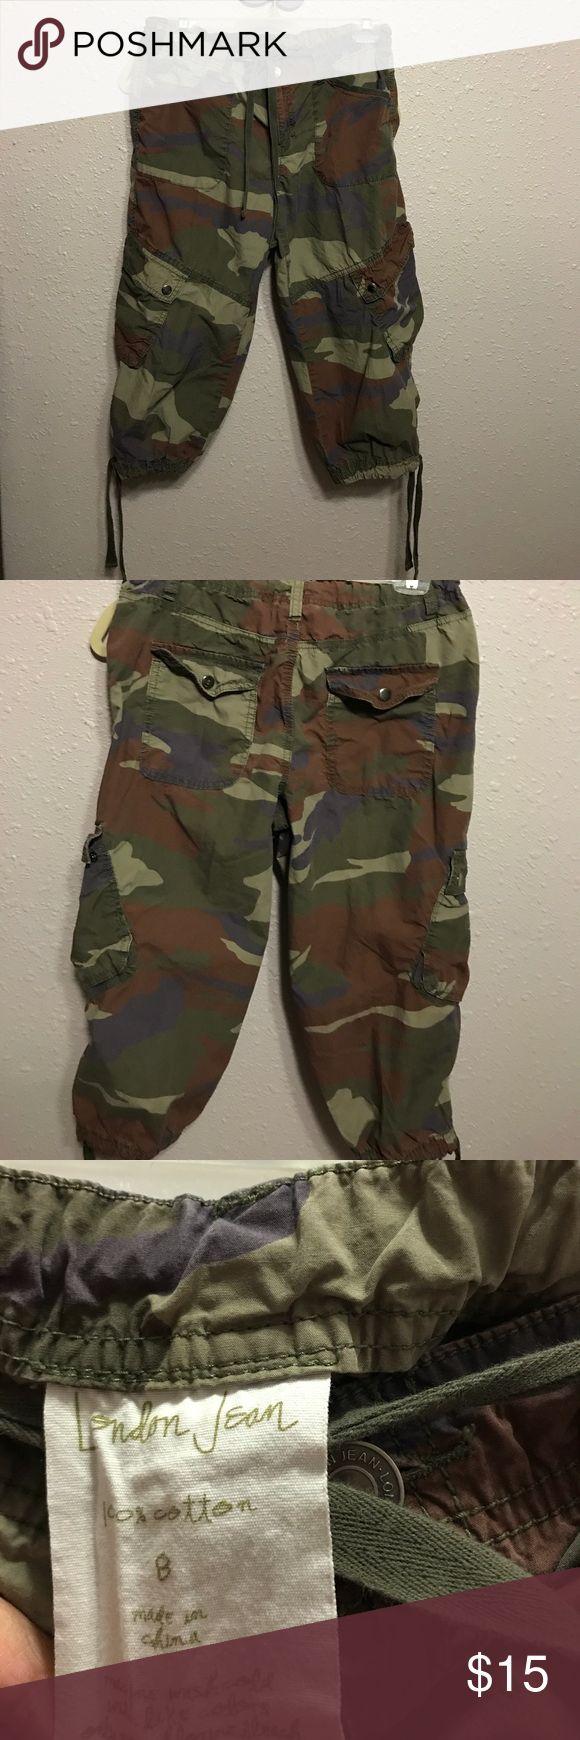 London Jean Military Capris Pants London Jean Camouflage Capris Pants Size 8. In great condition. Smoke free home London Jean Pants Capris